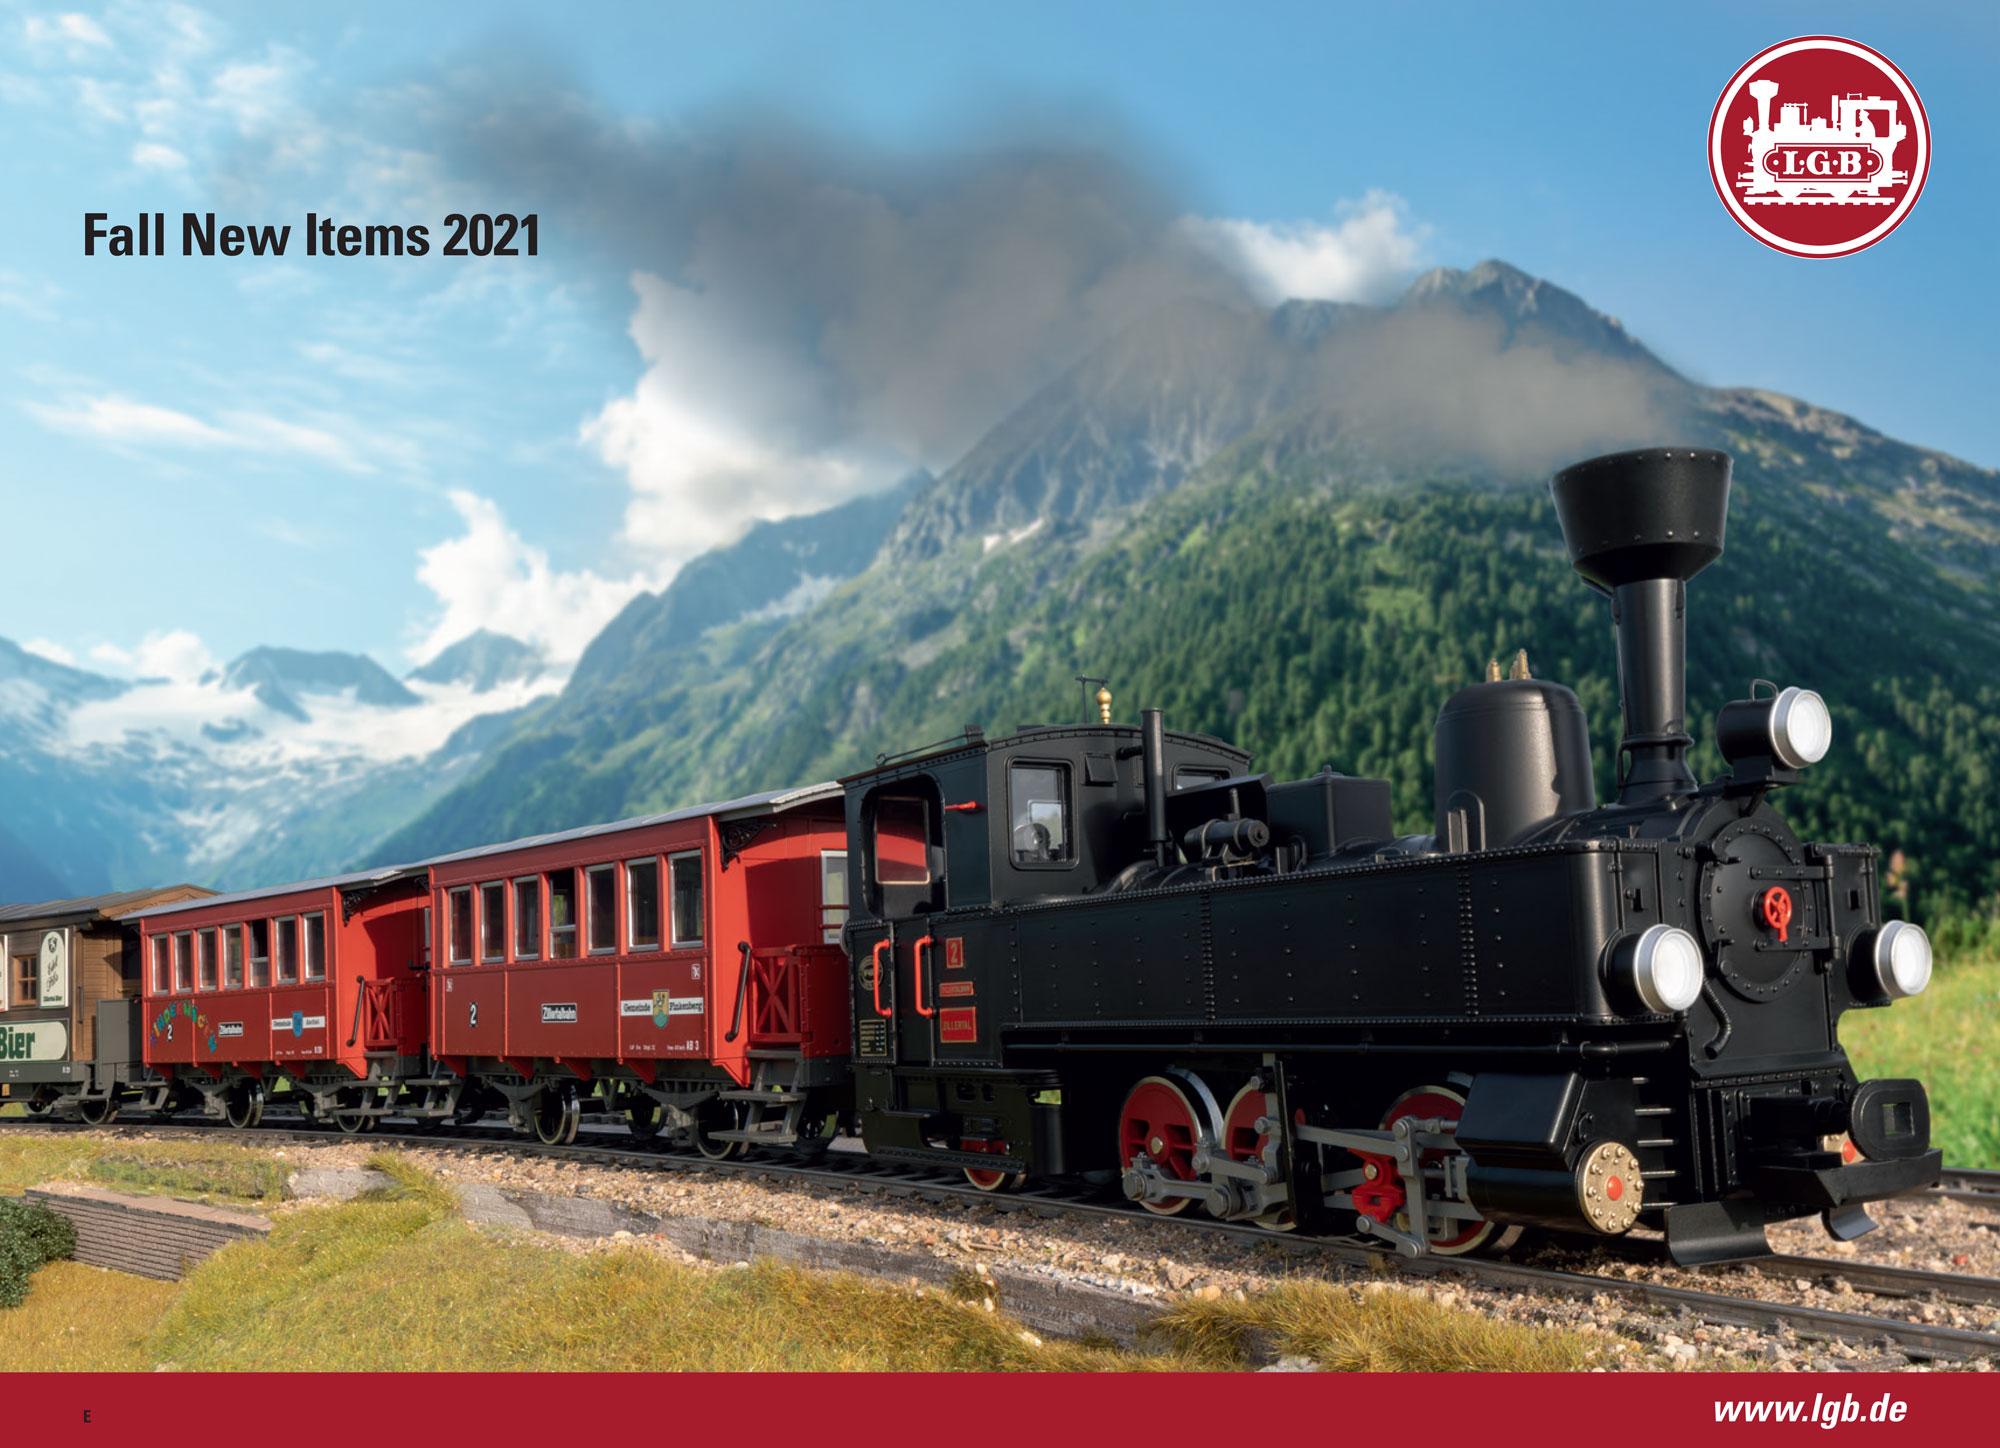 LGB - Novelties Fall 2021 catalog